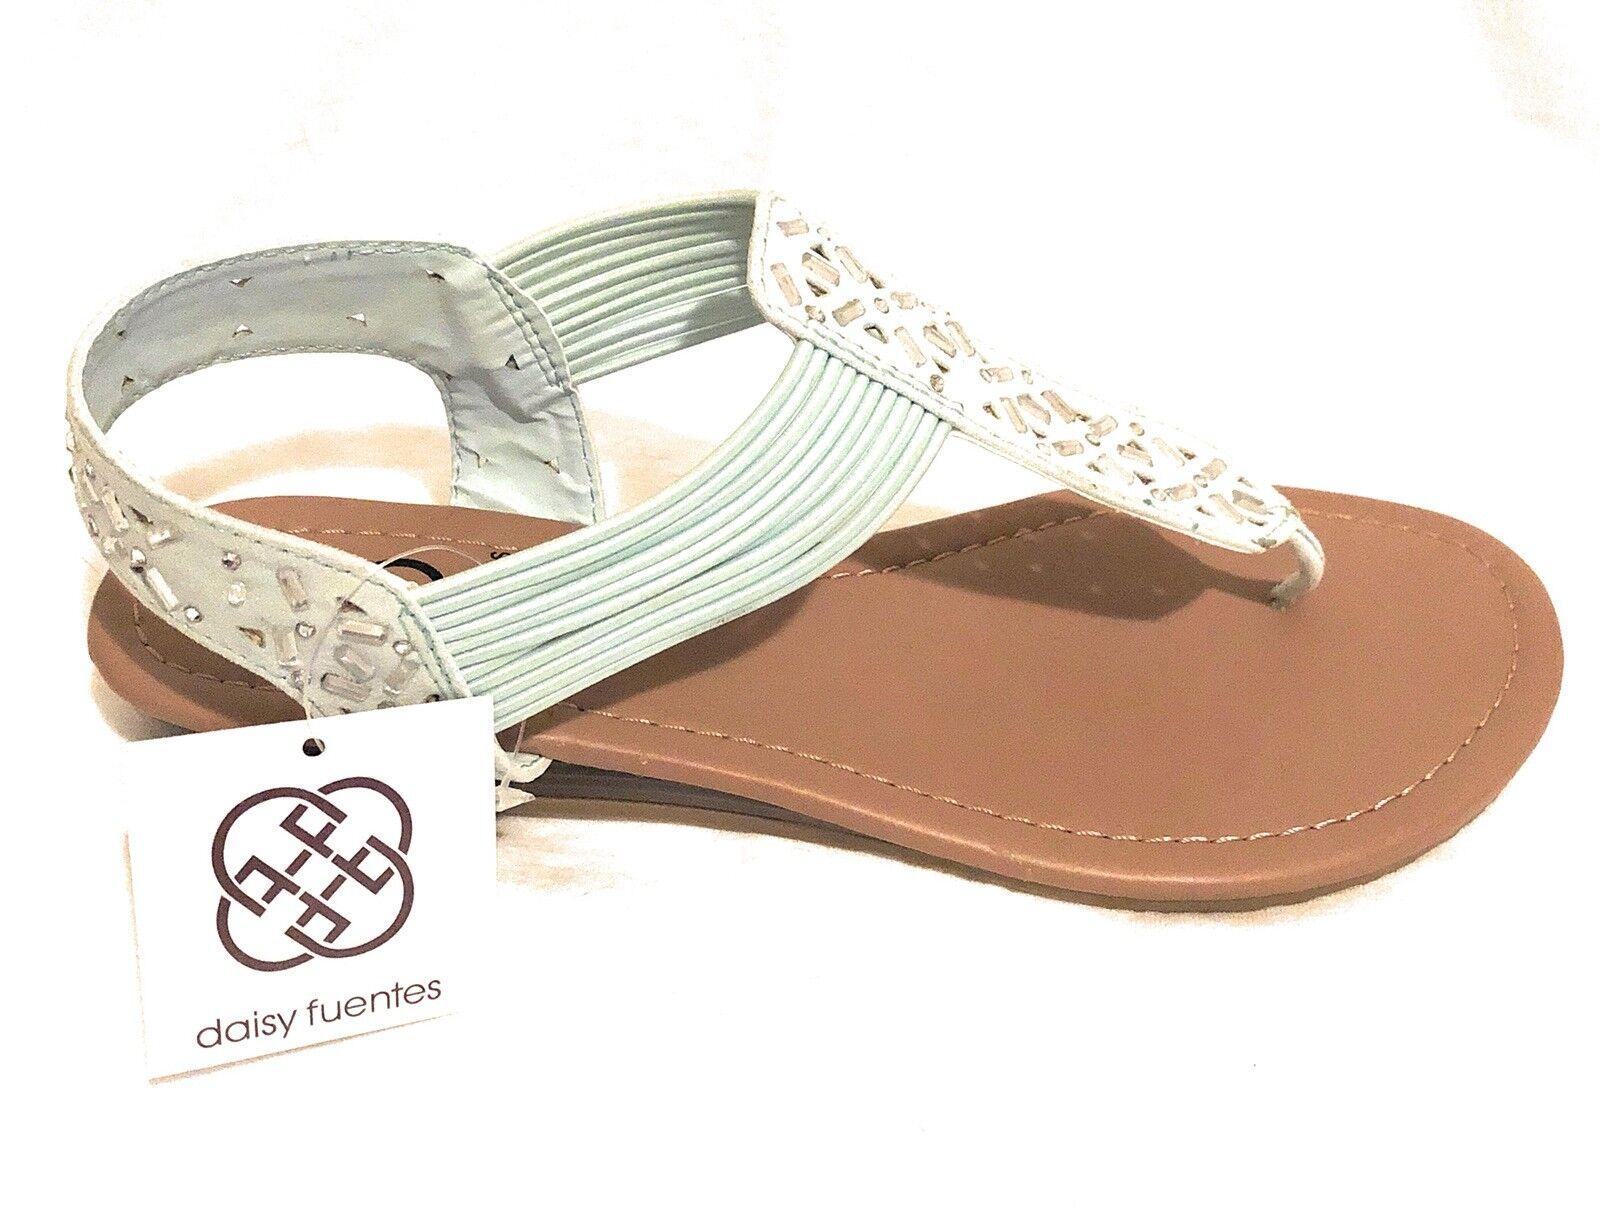 Daisy Vegan Fuentes Vegan Daisy Gracie Sandals Jeweled Thongs With Low Wedge Heel Size 8M US 707da8